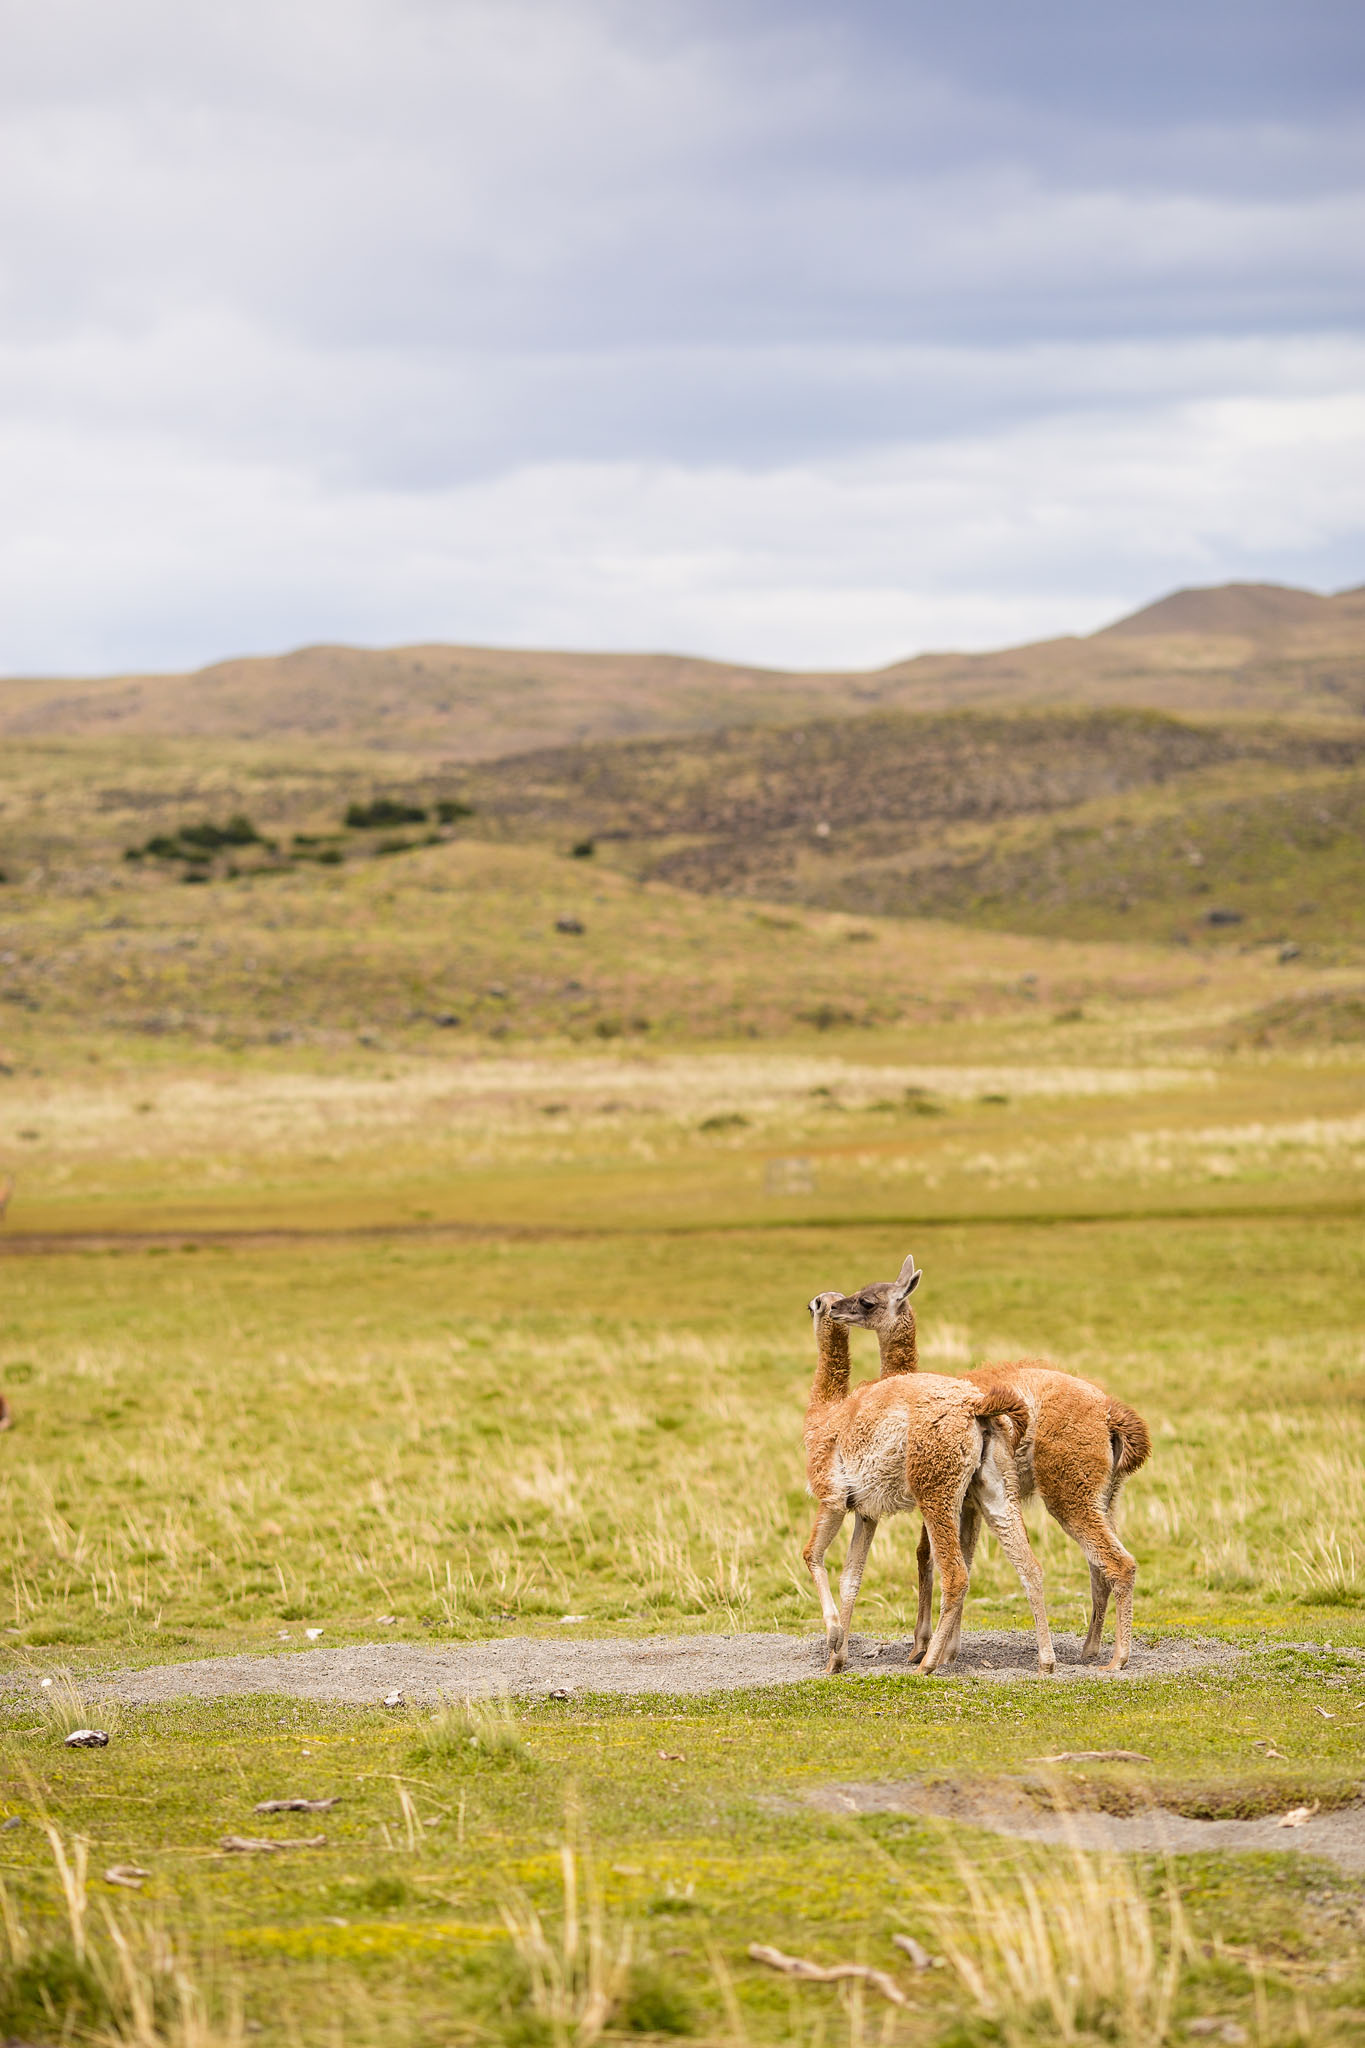 Wedding-Travellers-Overlanding-Destination-Wedding-Chile-Torres-del-Paine-guanaco-llama-lama